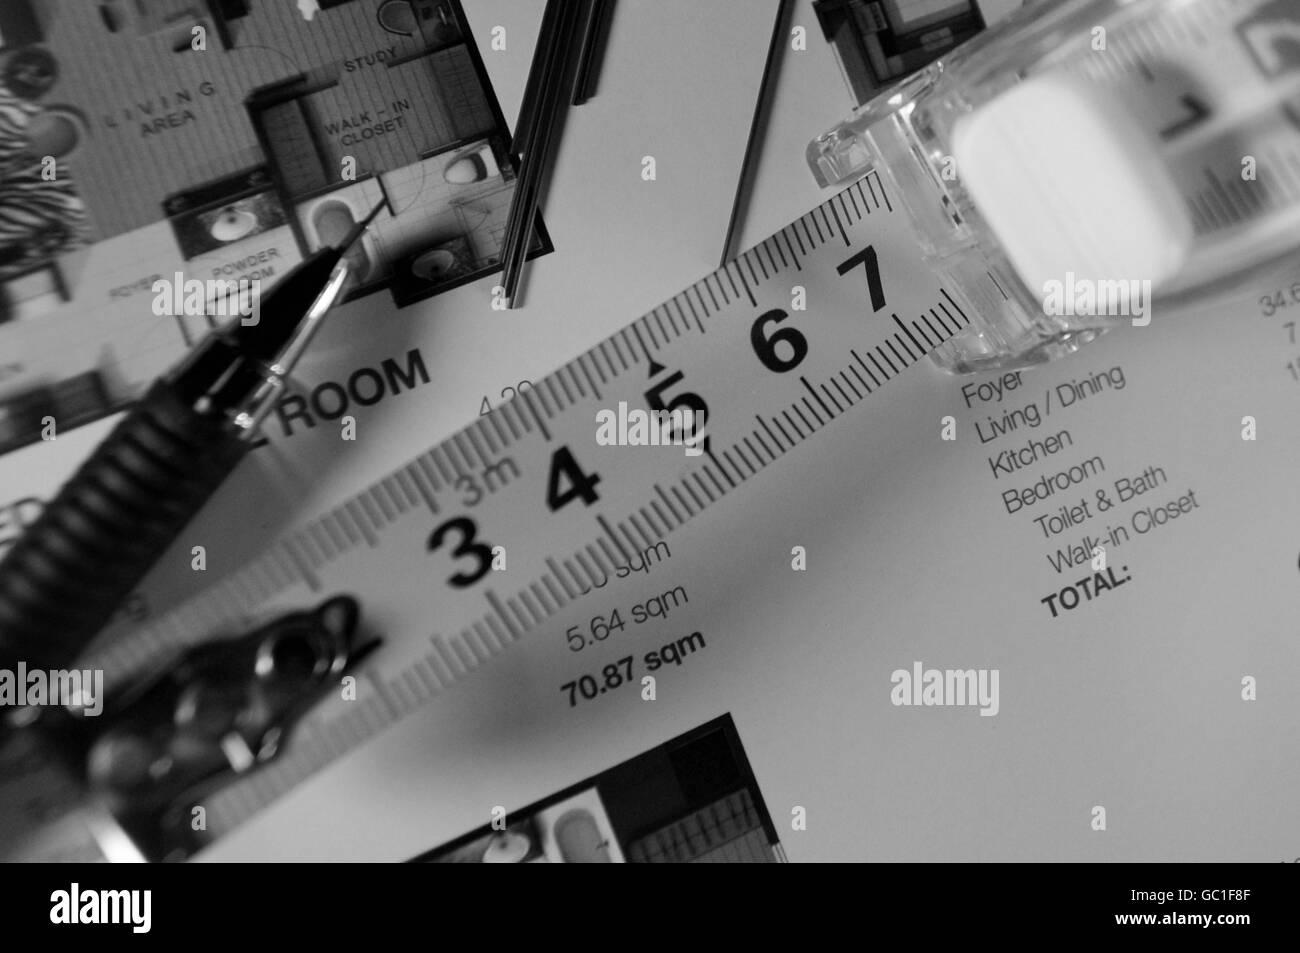 TAPE MEASUREMENTS - Stock Image